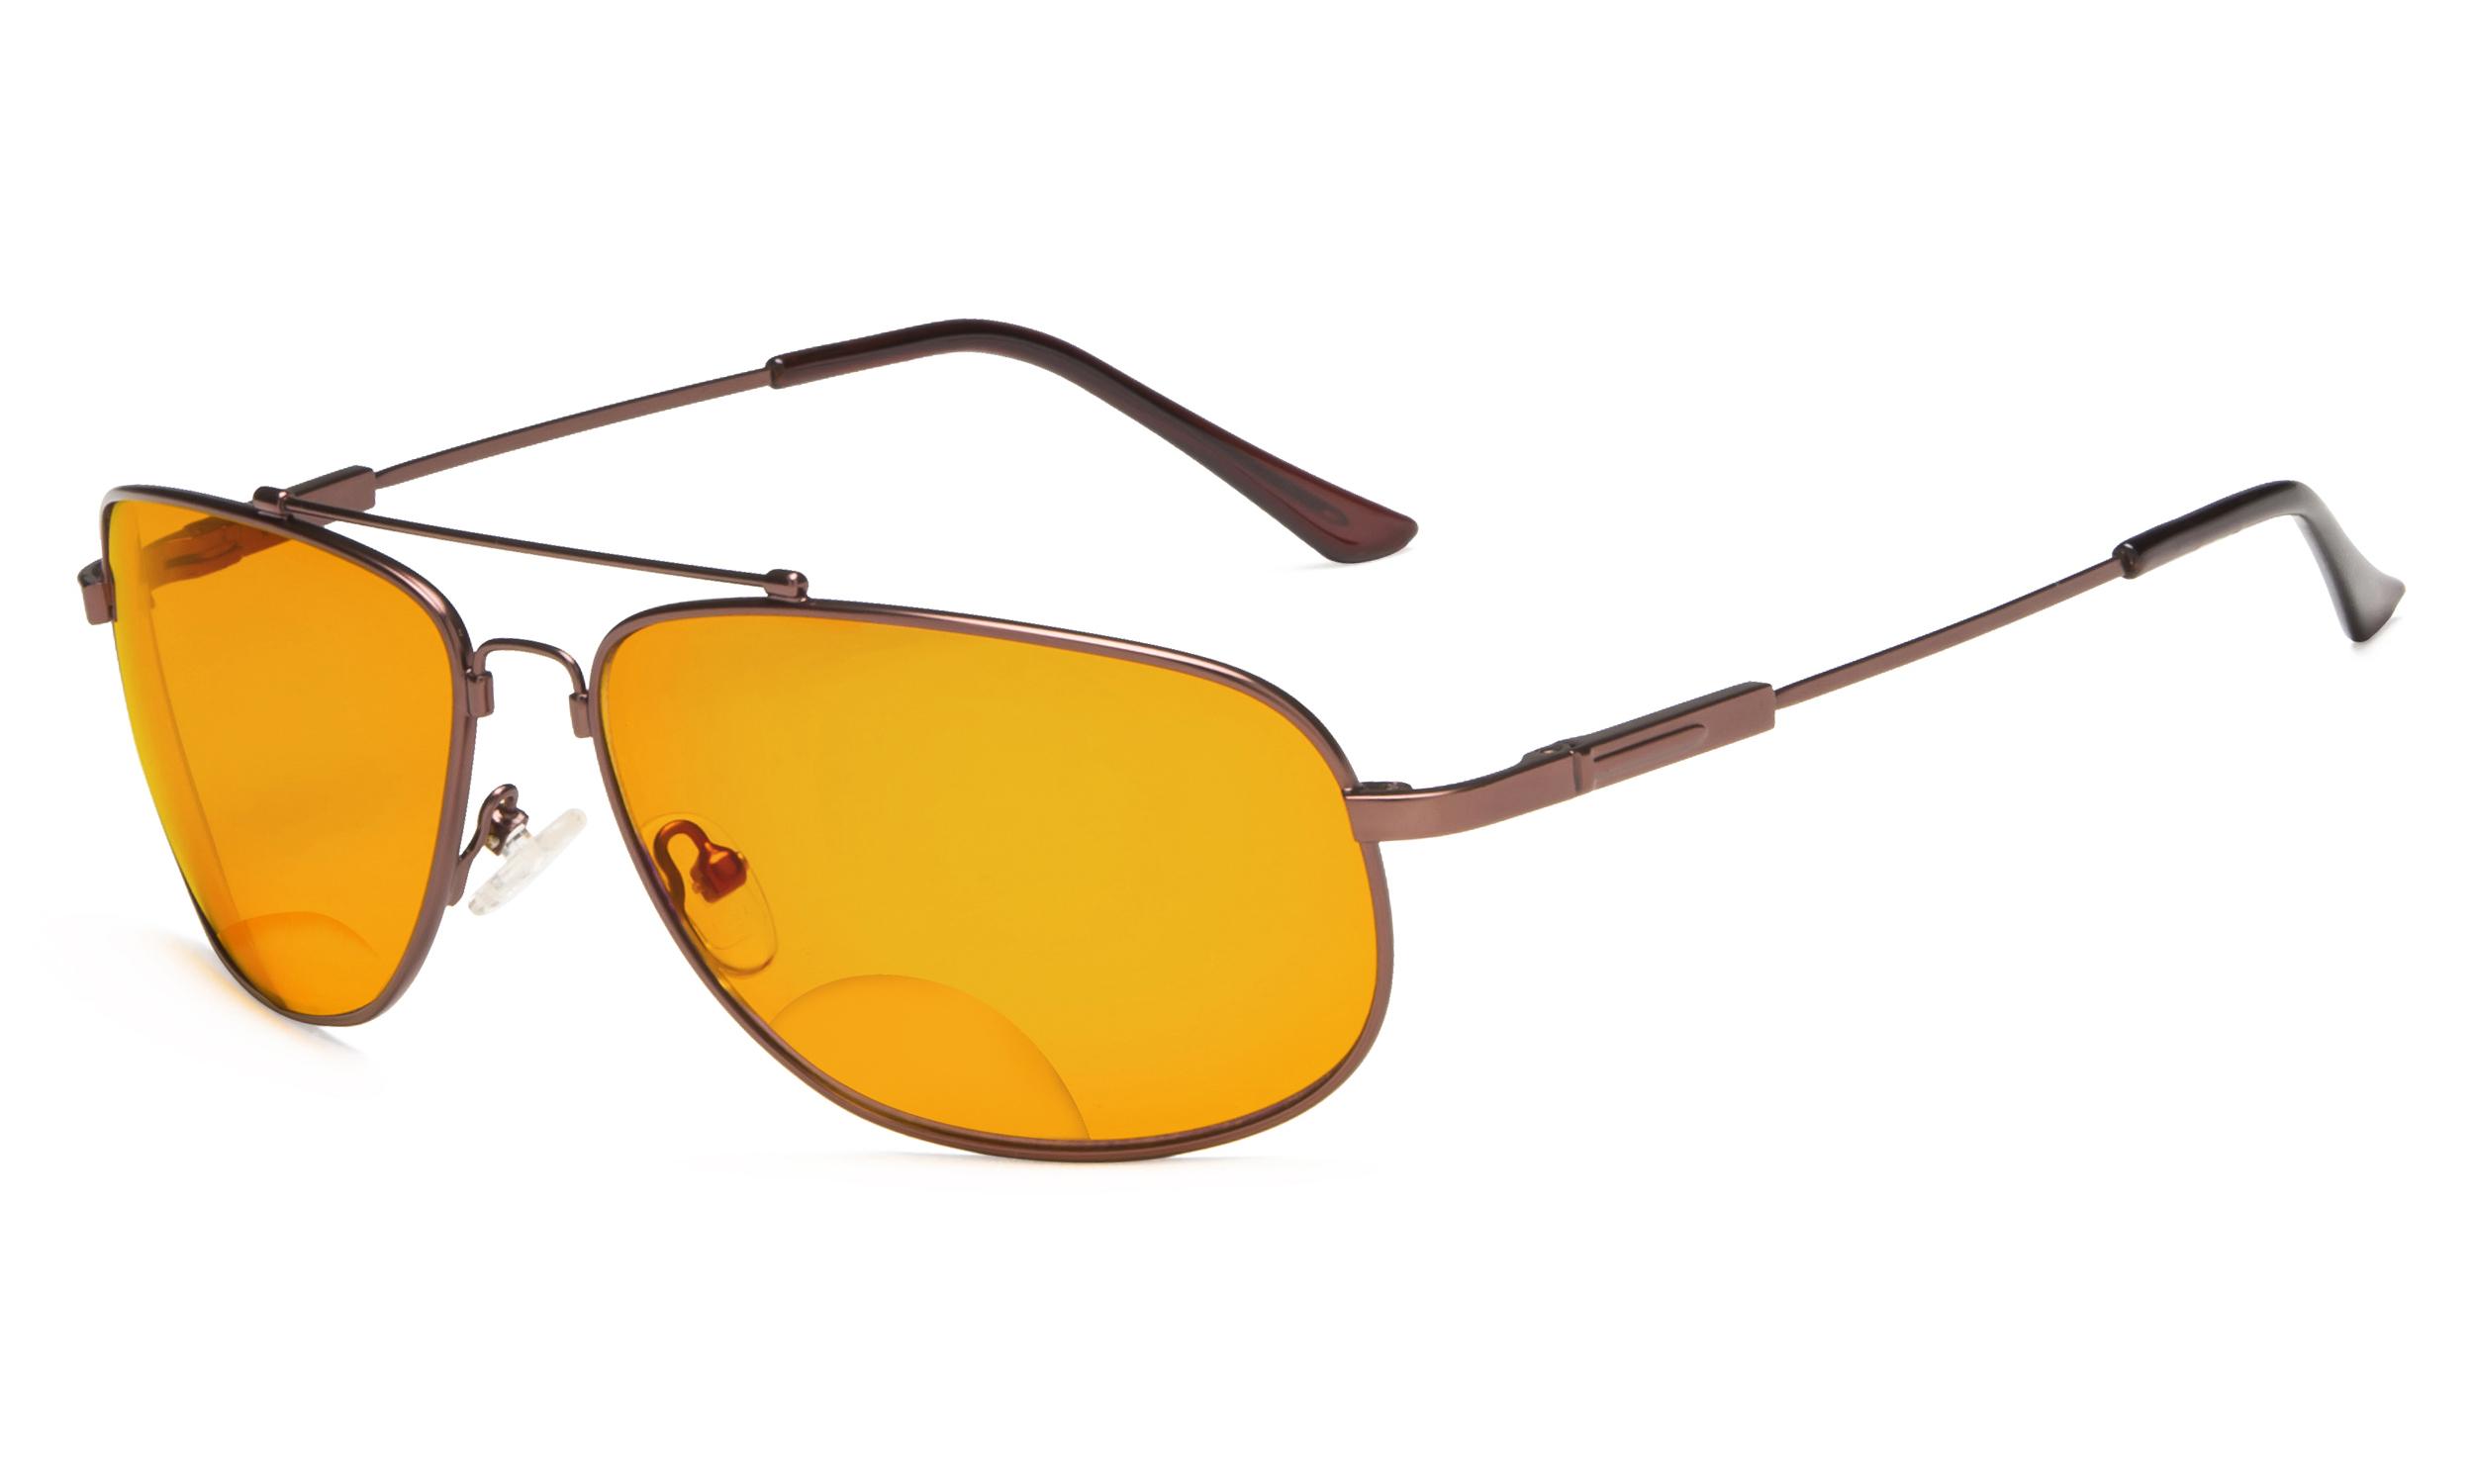 ca8e3fc86704 Eyekepper Bifocal Reading Glasses Blue Blocking for Sleep-Nighttime Memory  Frame Orange Tinted Brown DSSG1803